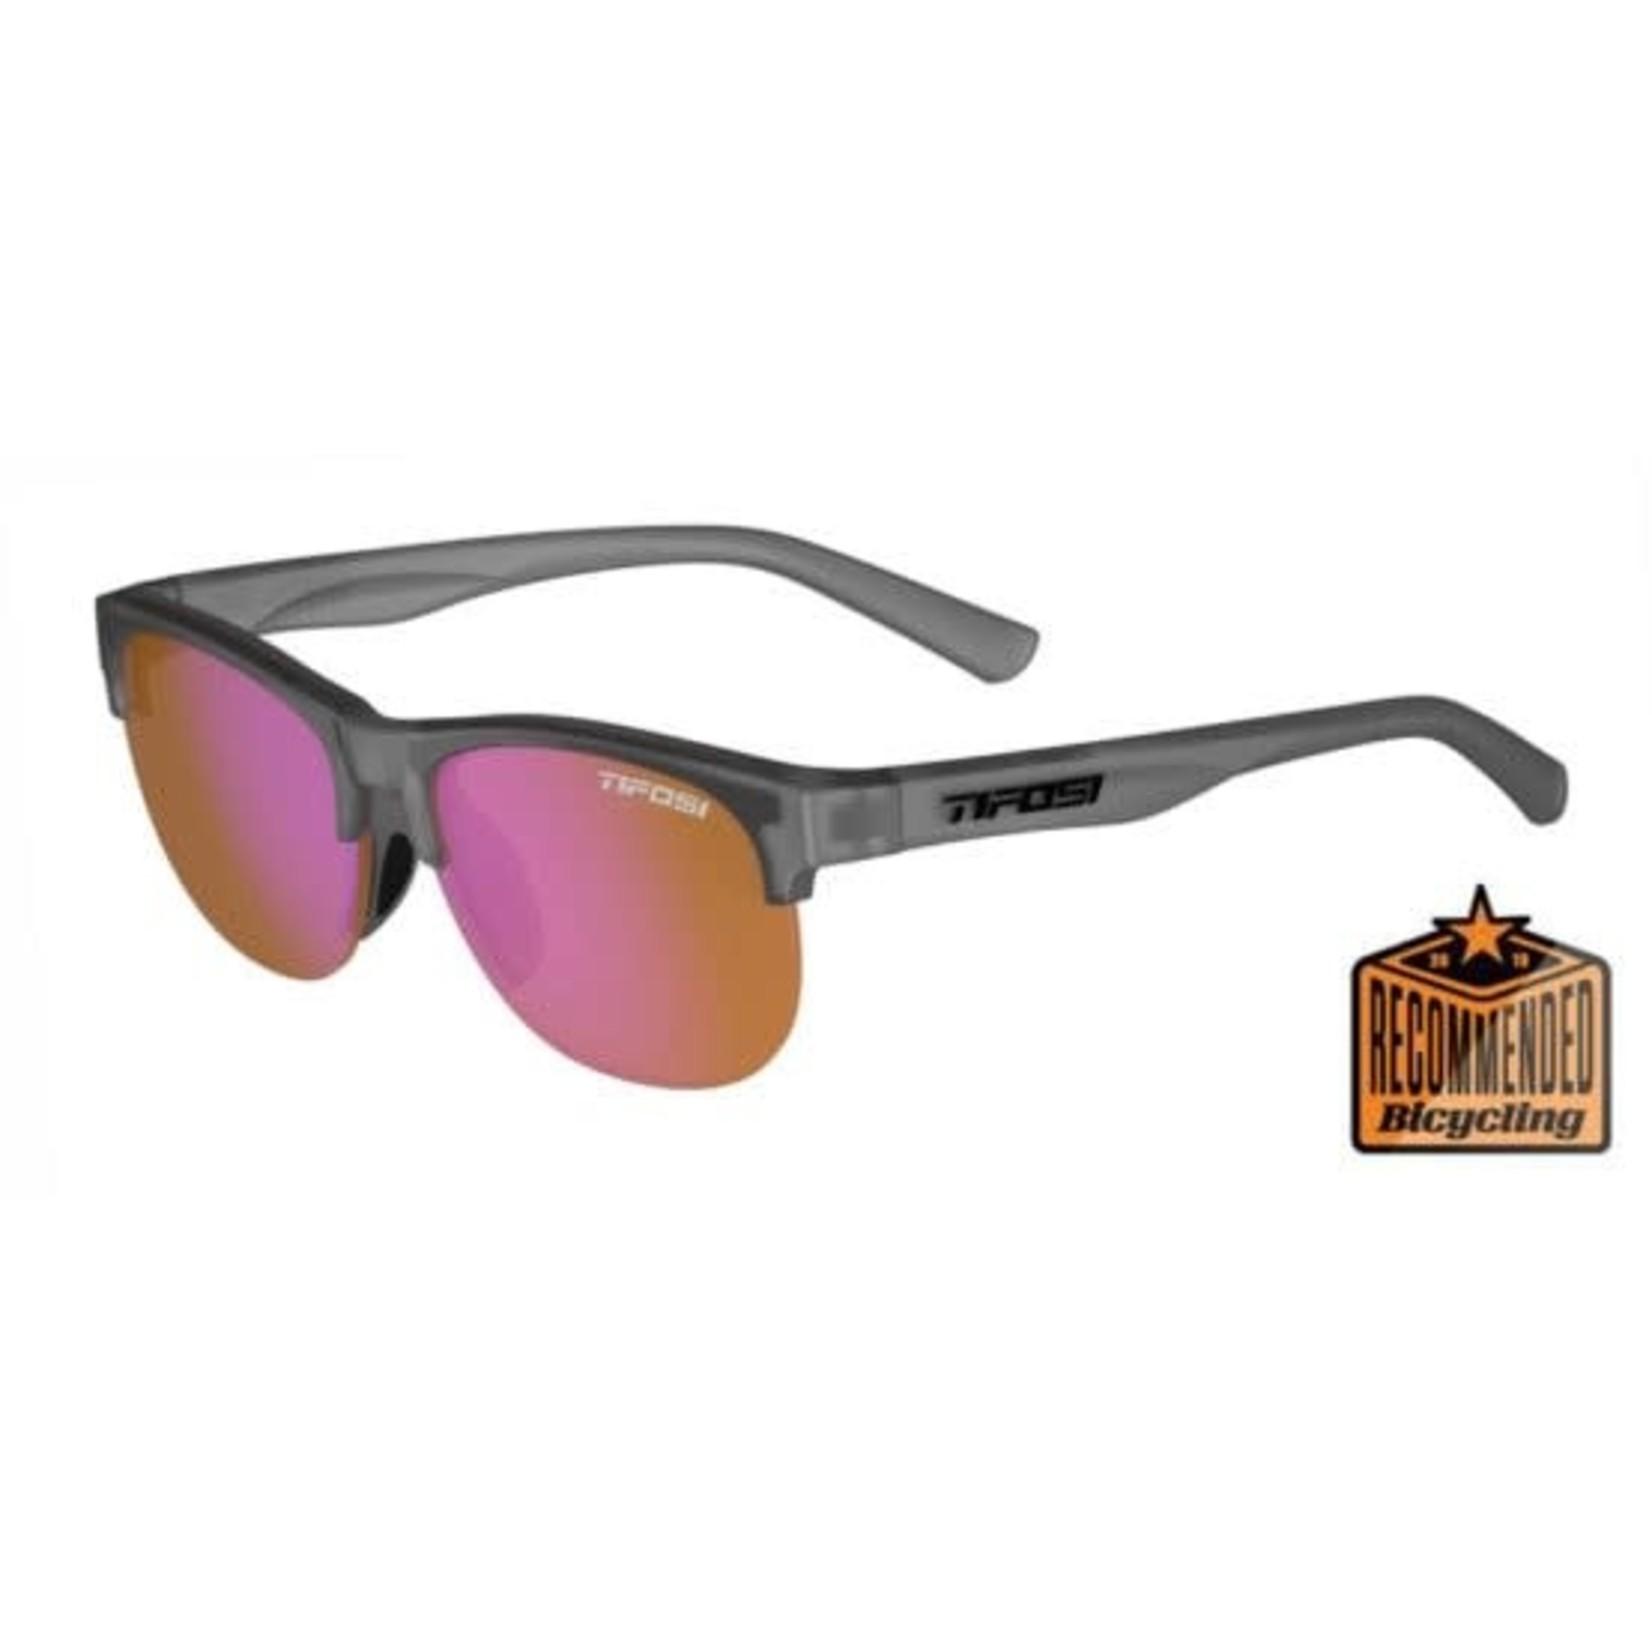 Tifosi Optics Swank SL, Satin Vapor Single Lens Sunglasses